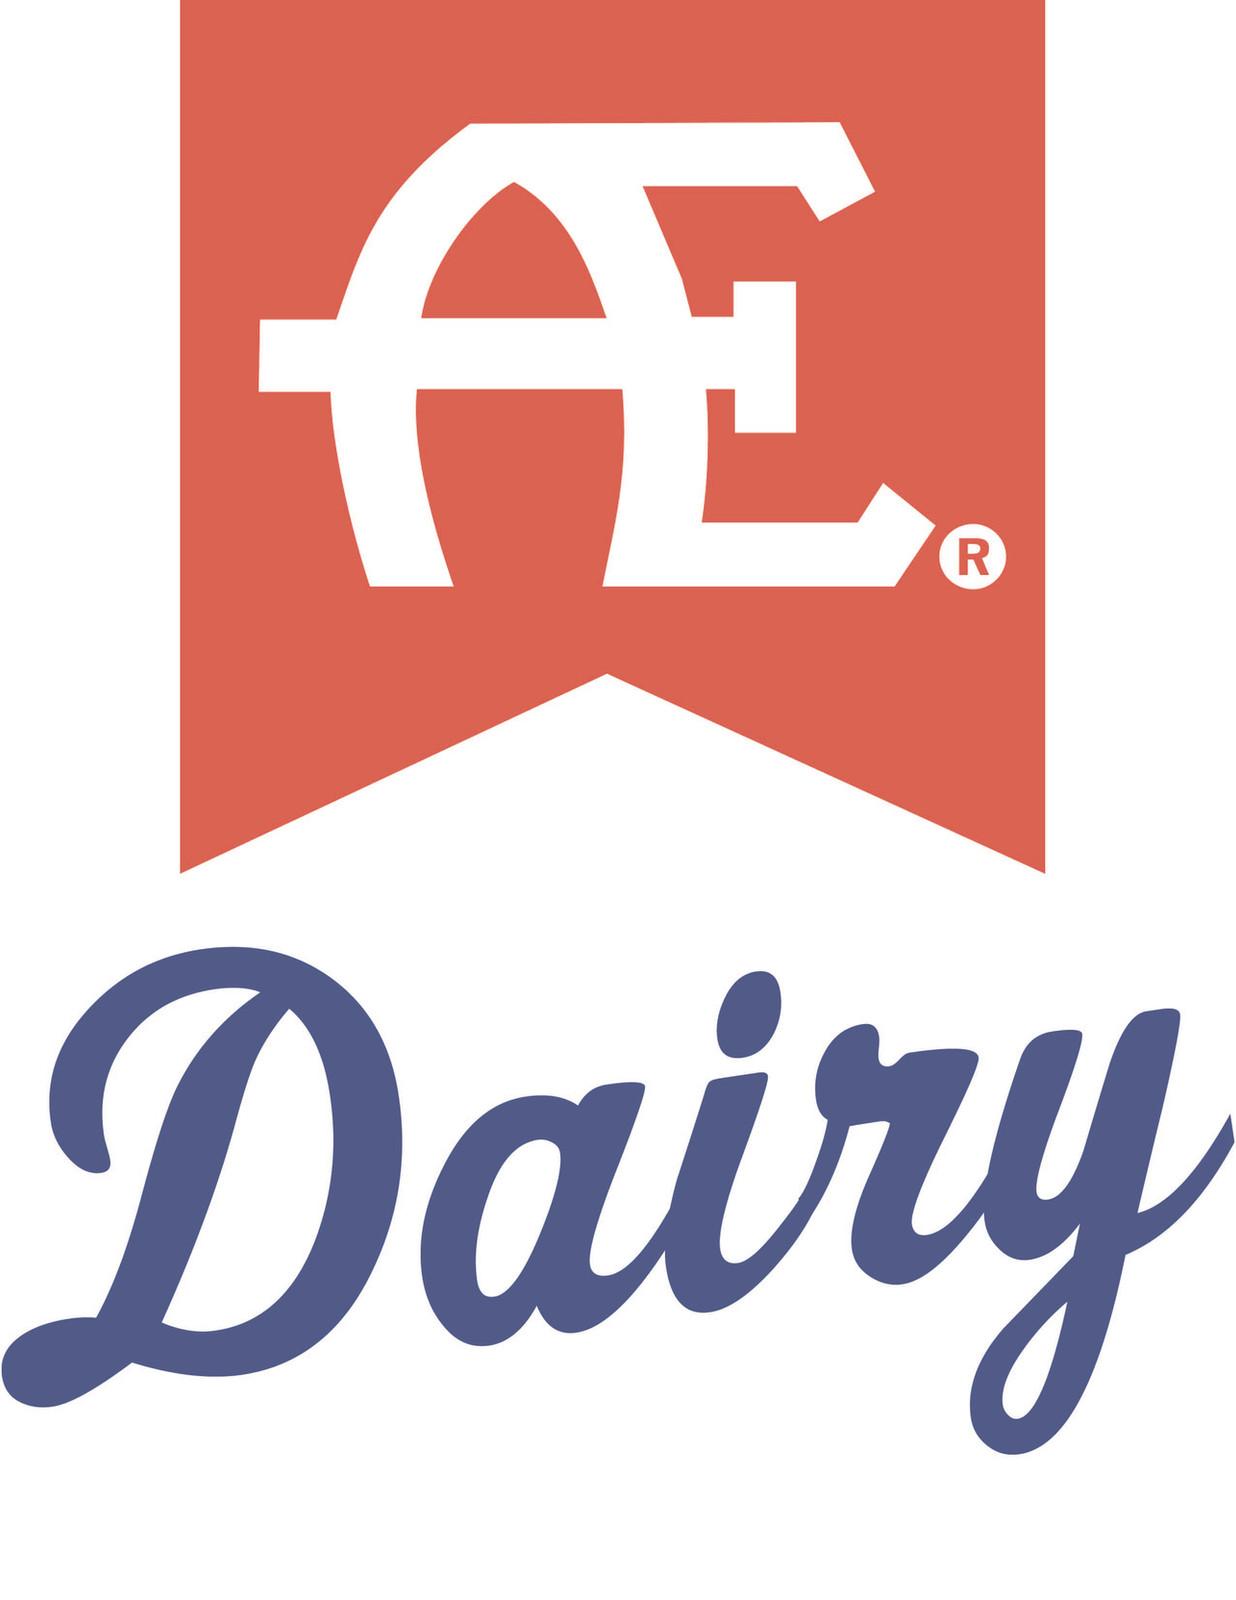 Anderson Erickson Dairy logo